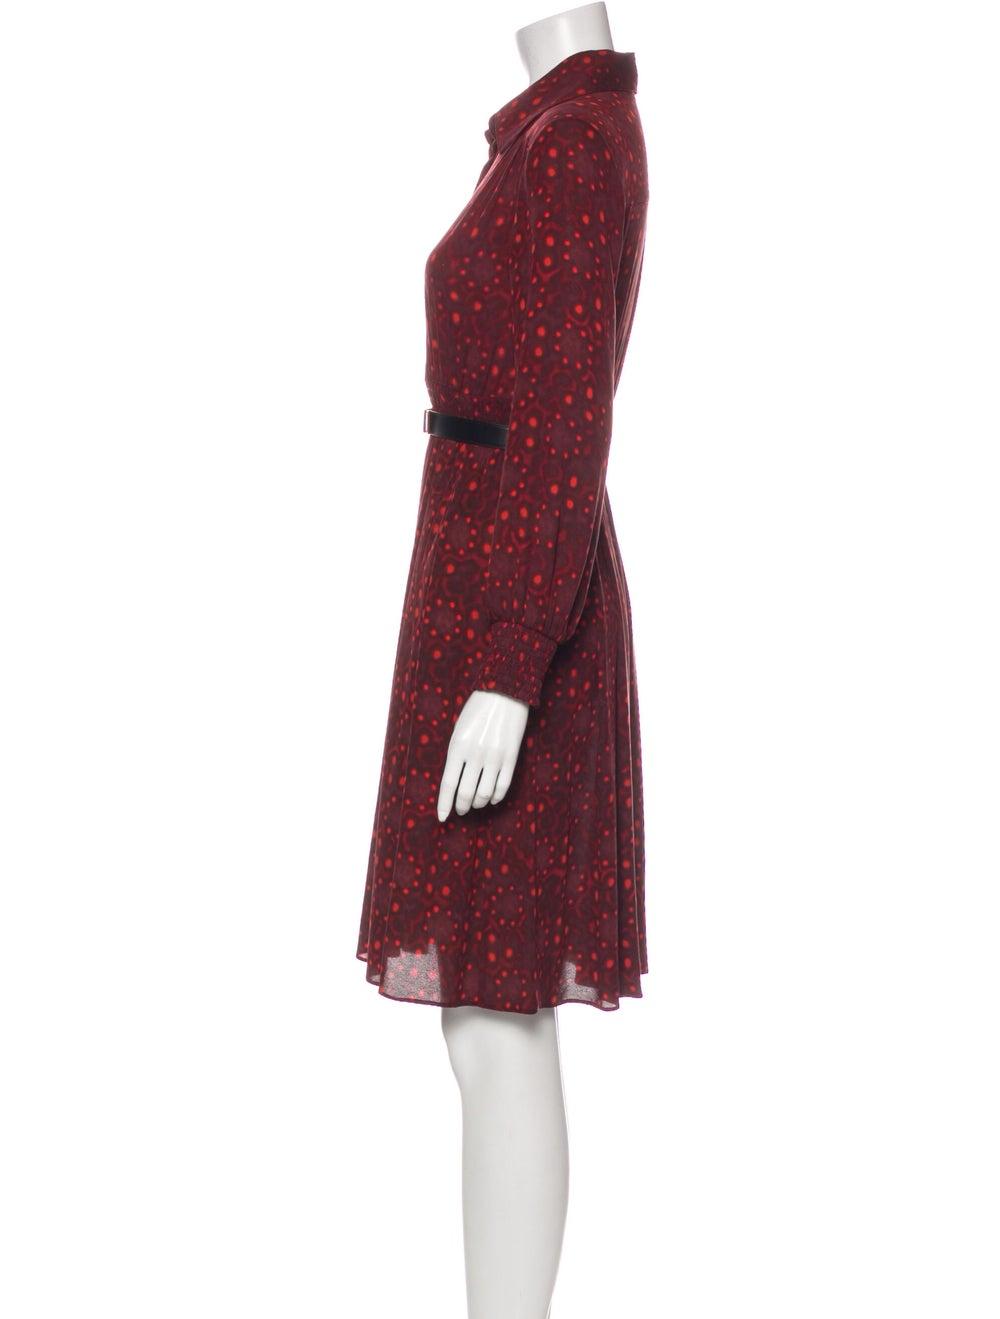 Alice + Olivia Silk Knee-Length Dress - image 2